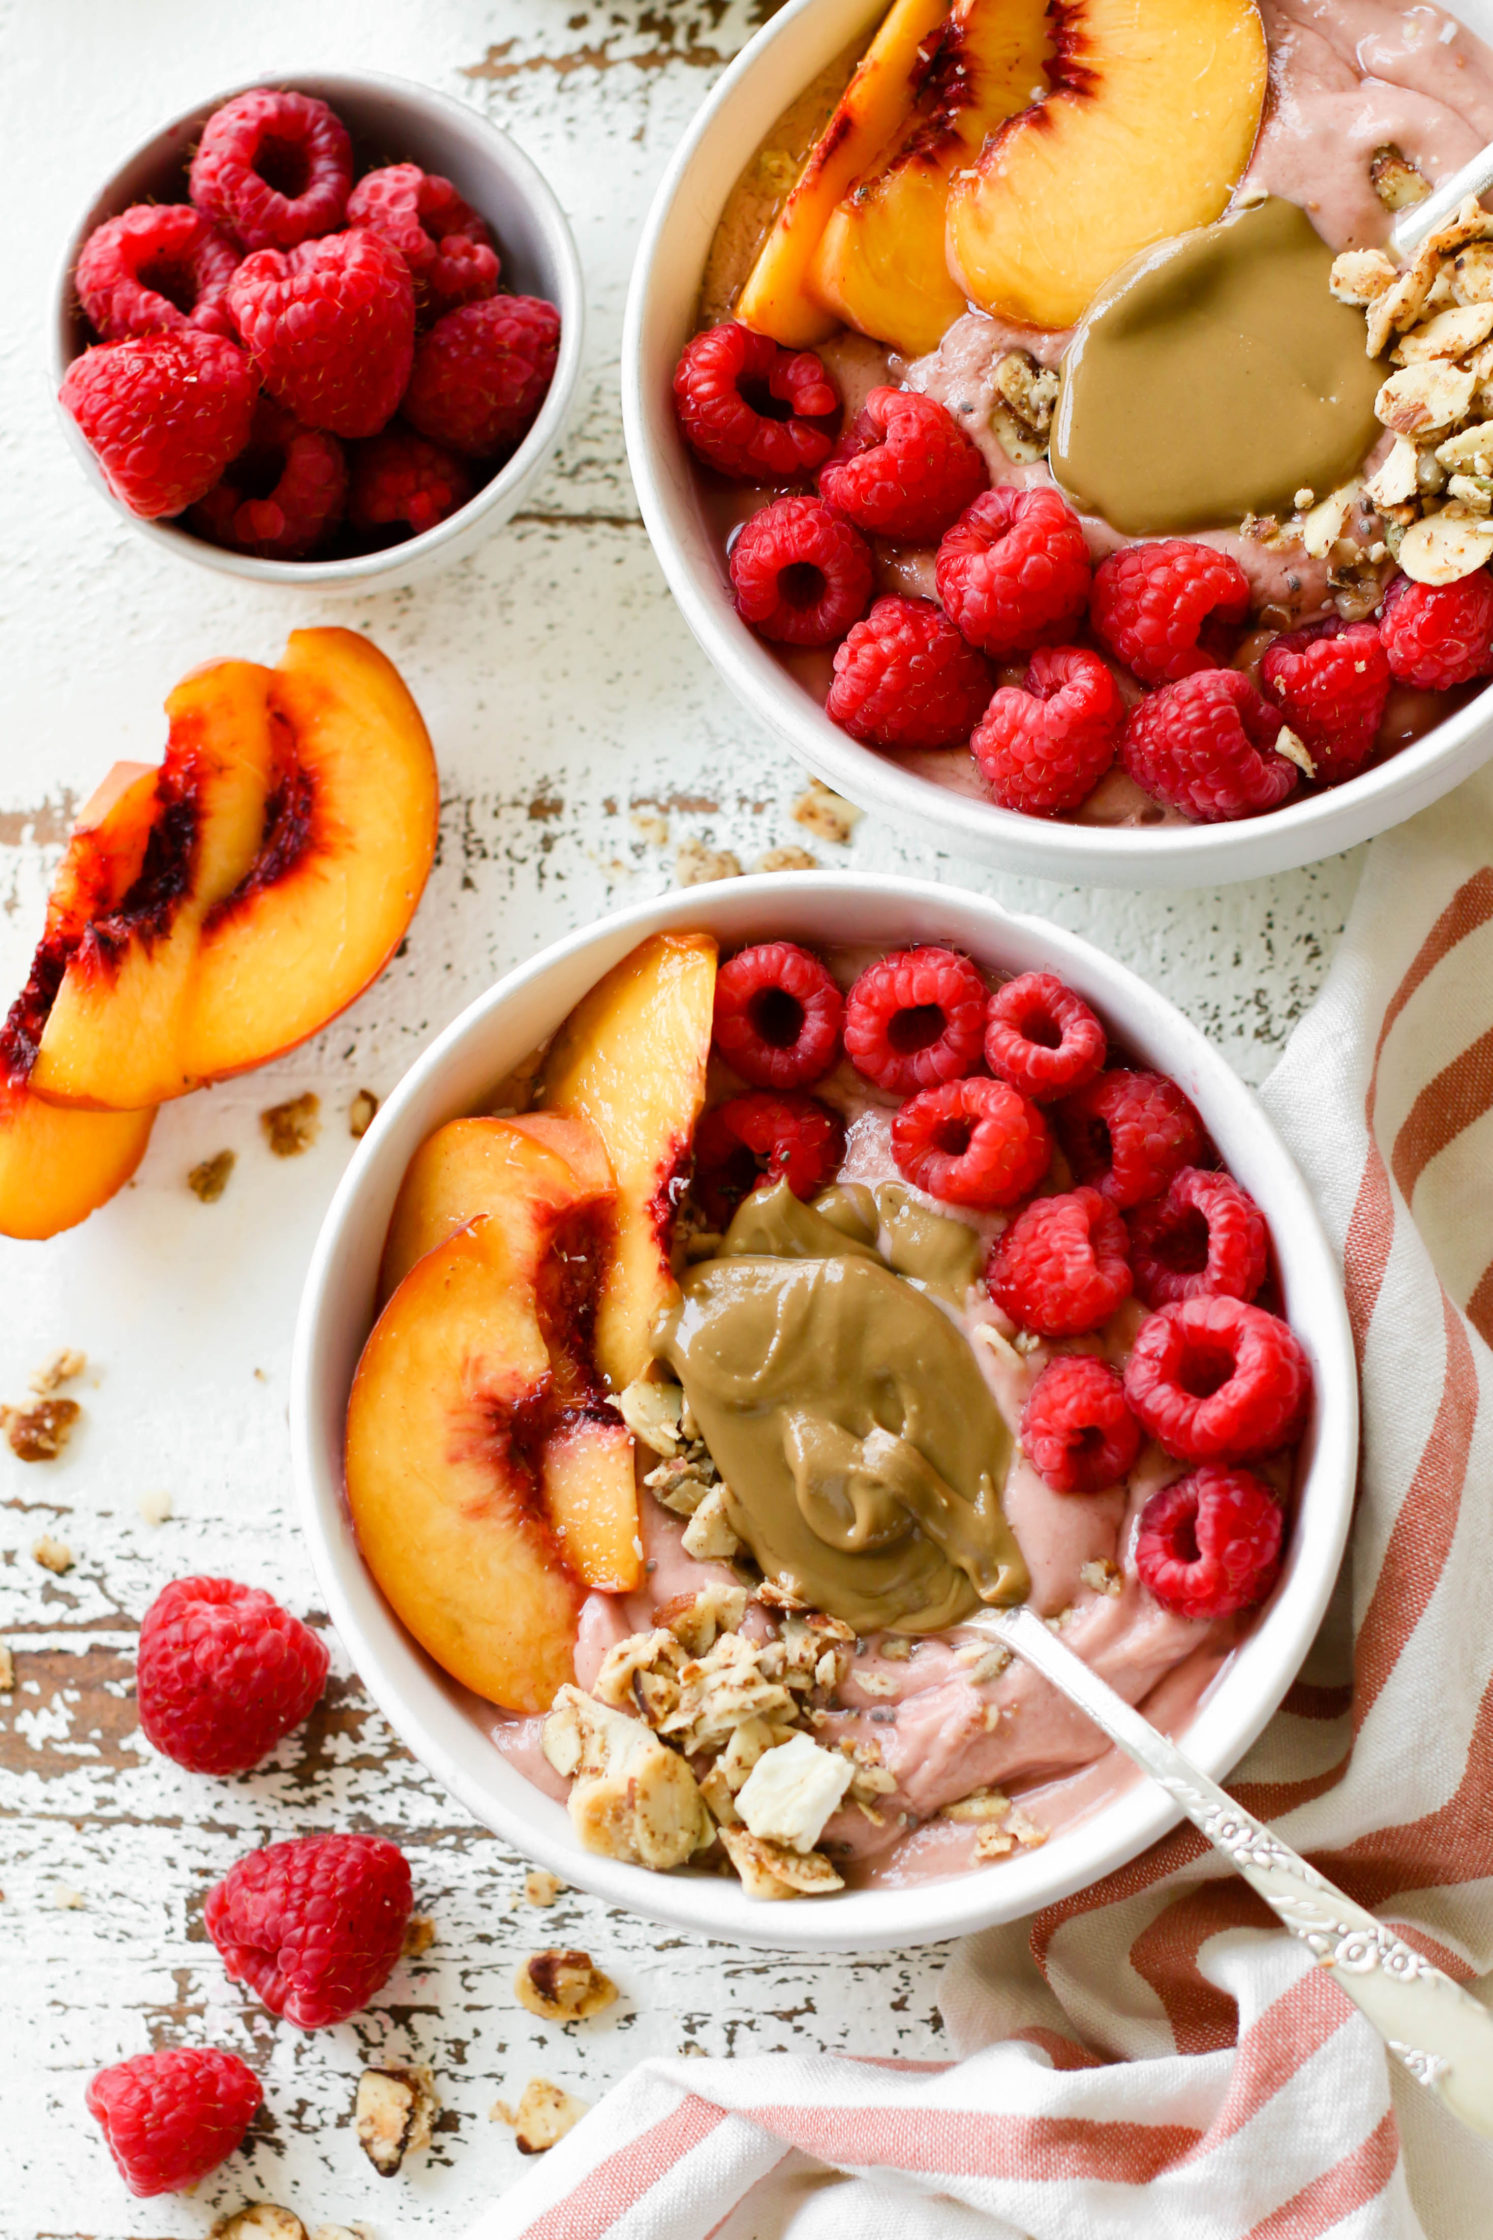 Peach Raspberry Sunbutter Smoothie Bowl by Flora & Vino